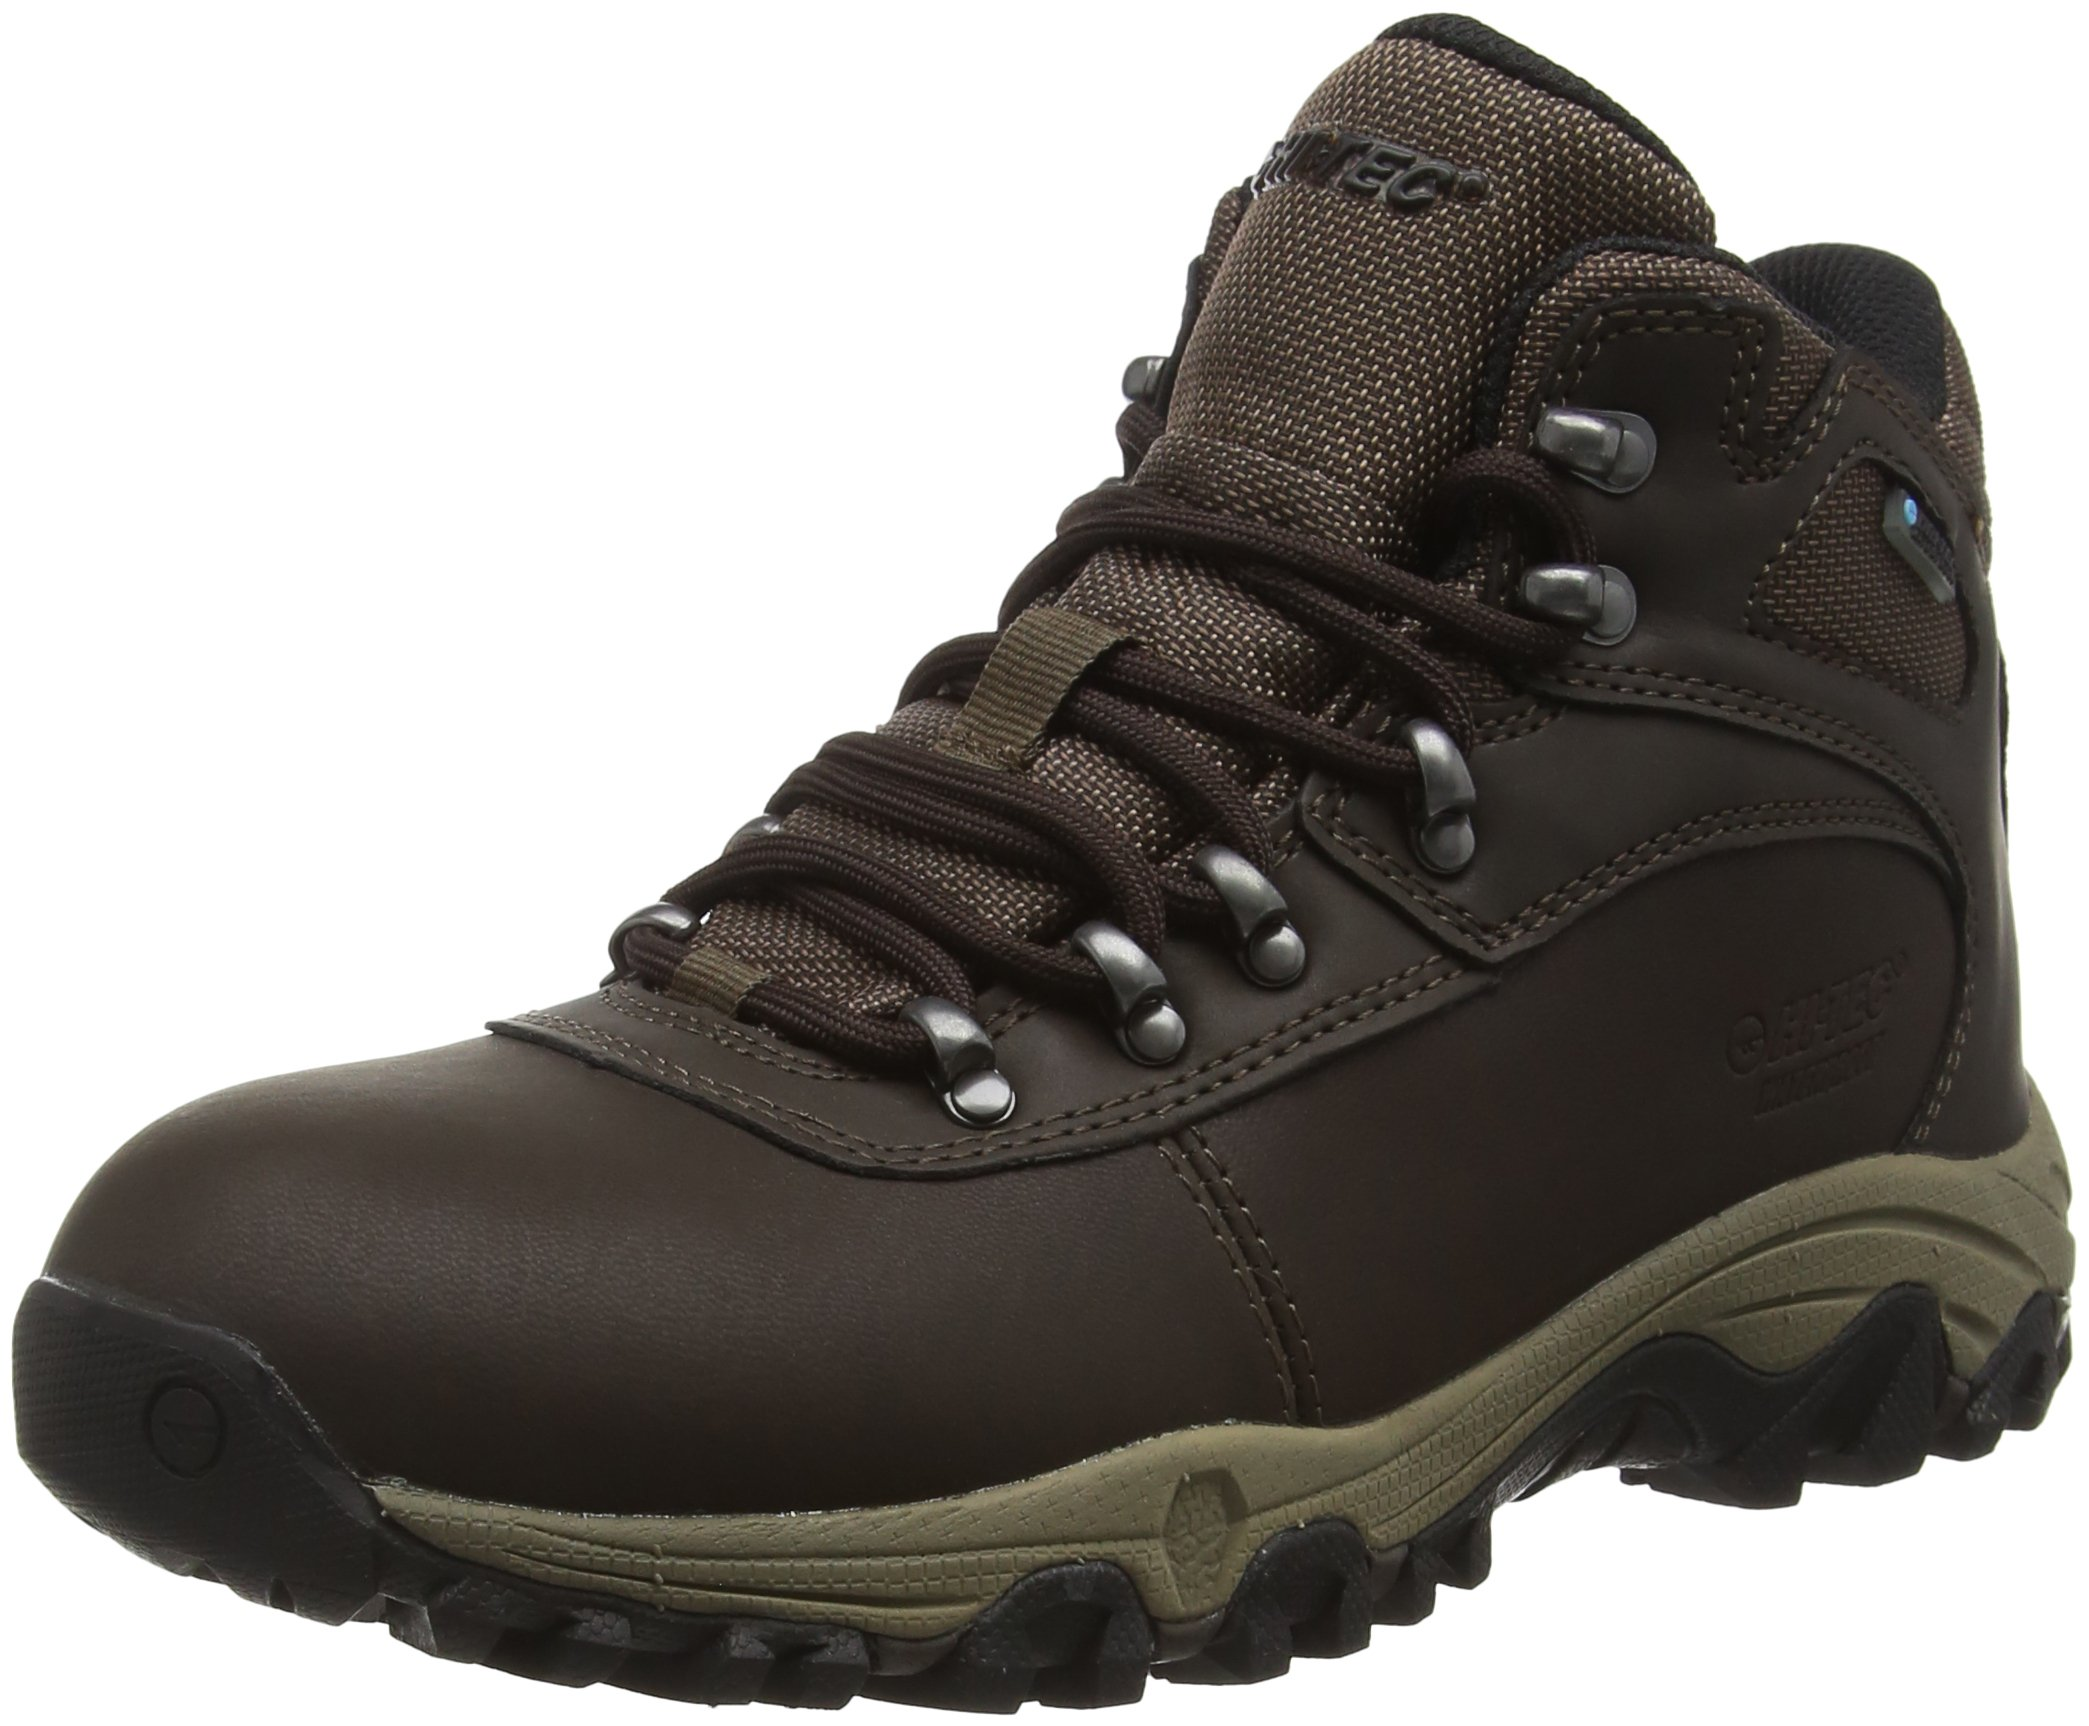 Hi-Tec Women's Cascadia Waterproof High Rise Hiking Boots 1